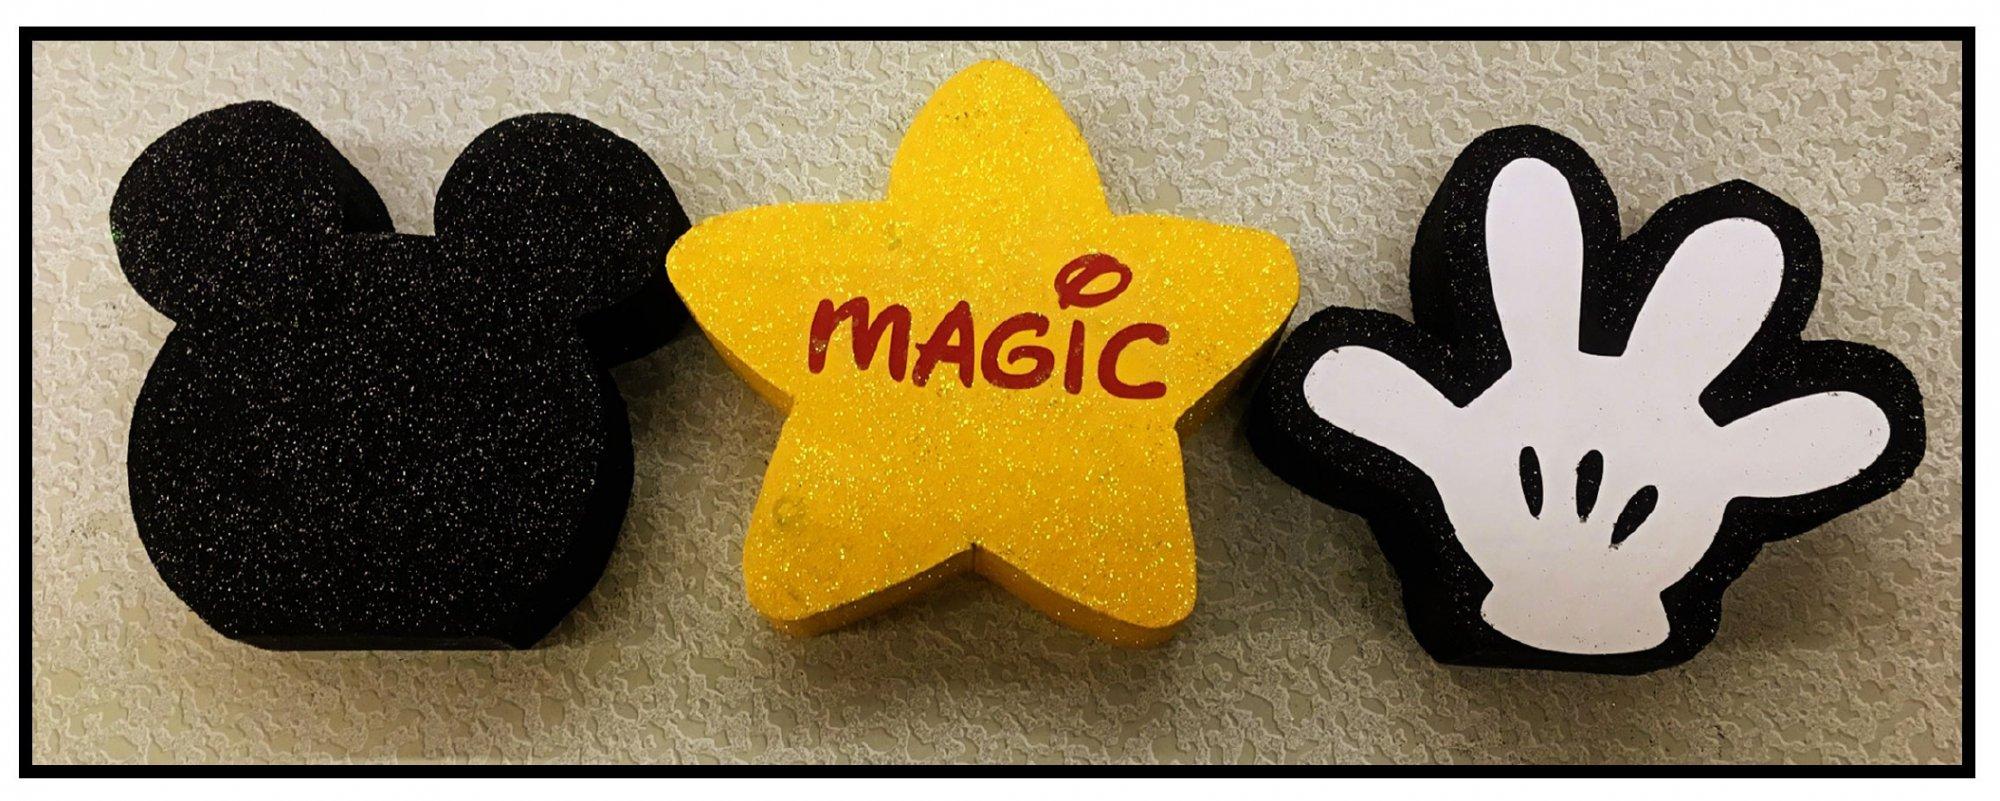 Disney Shapes - Magic w/vinyl